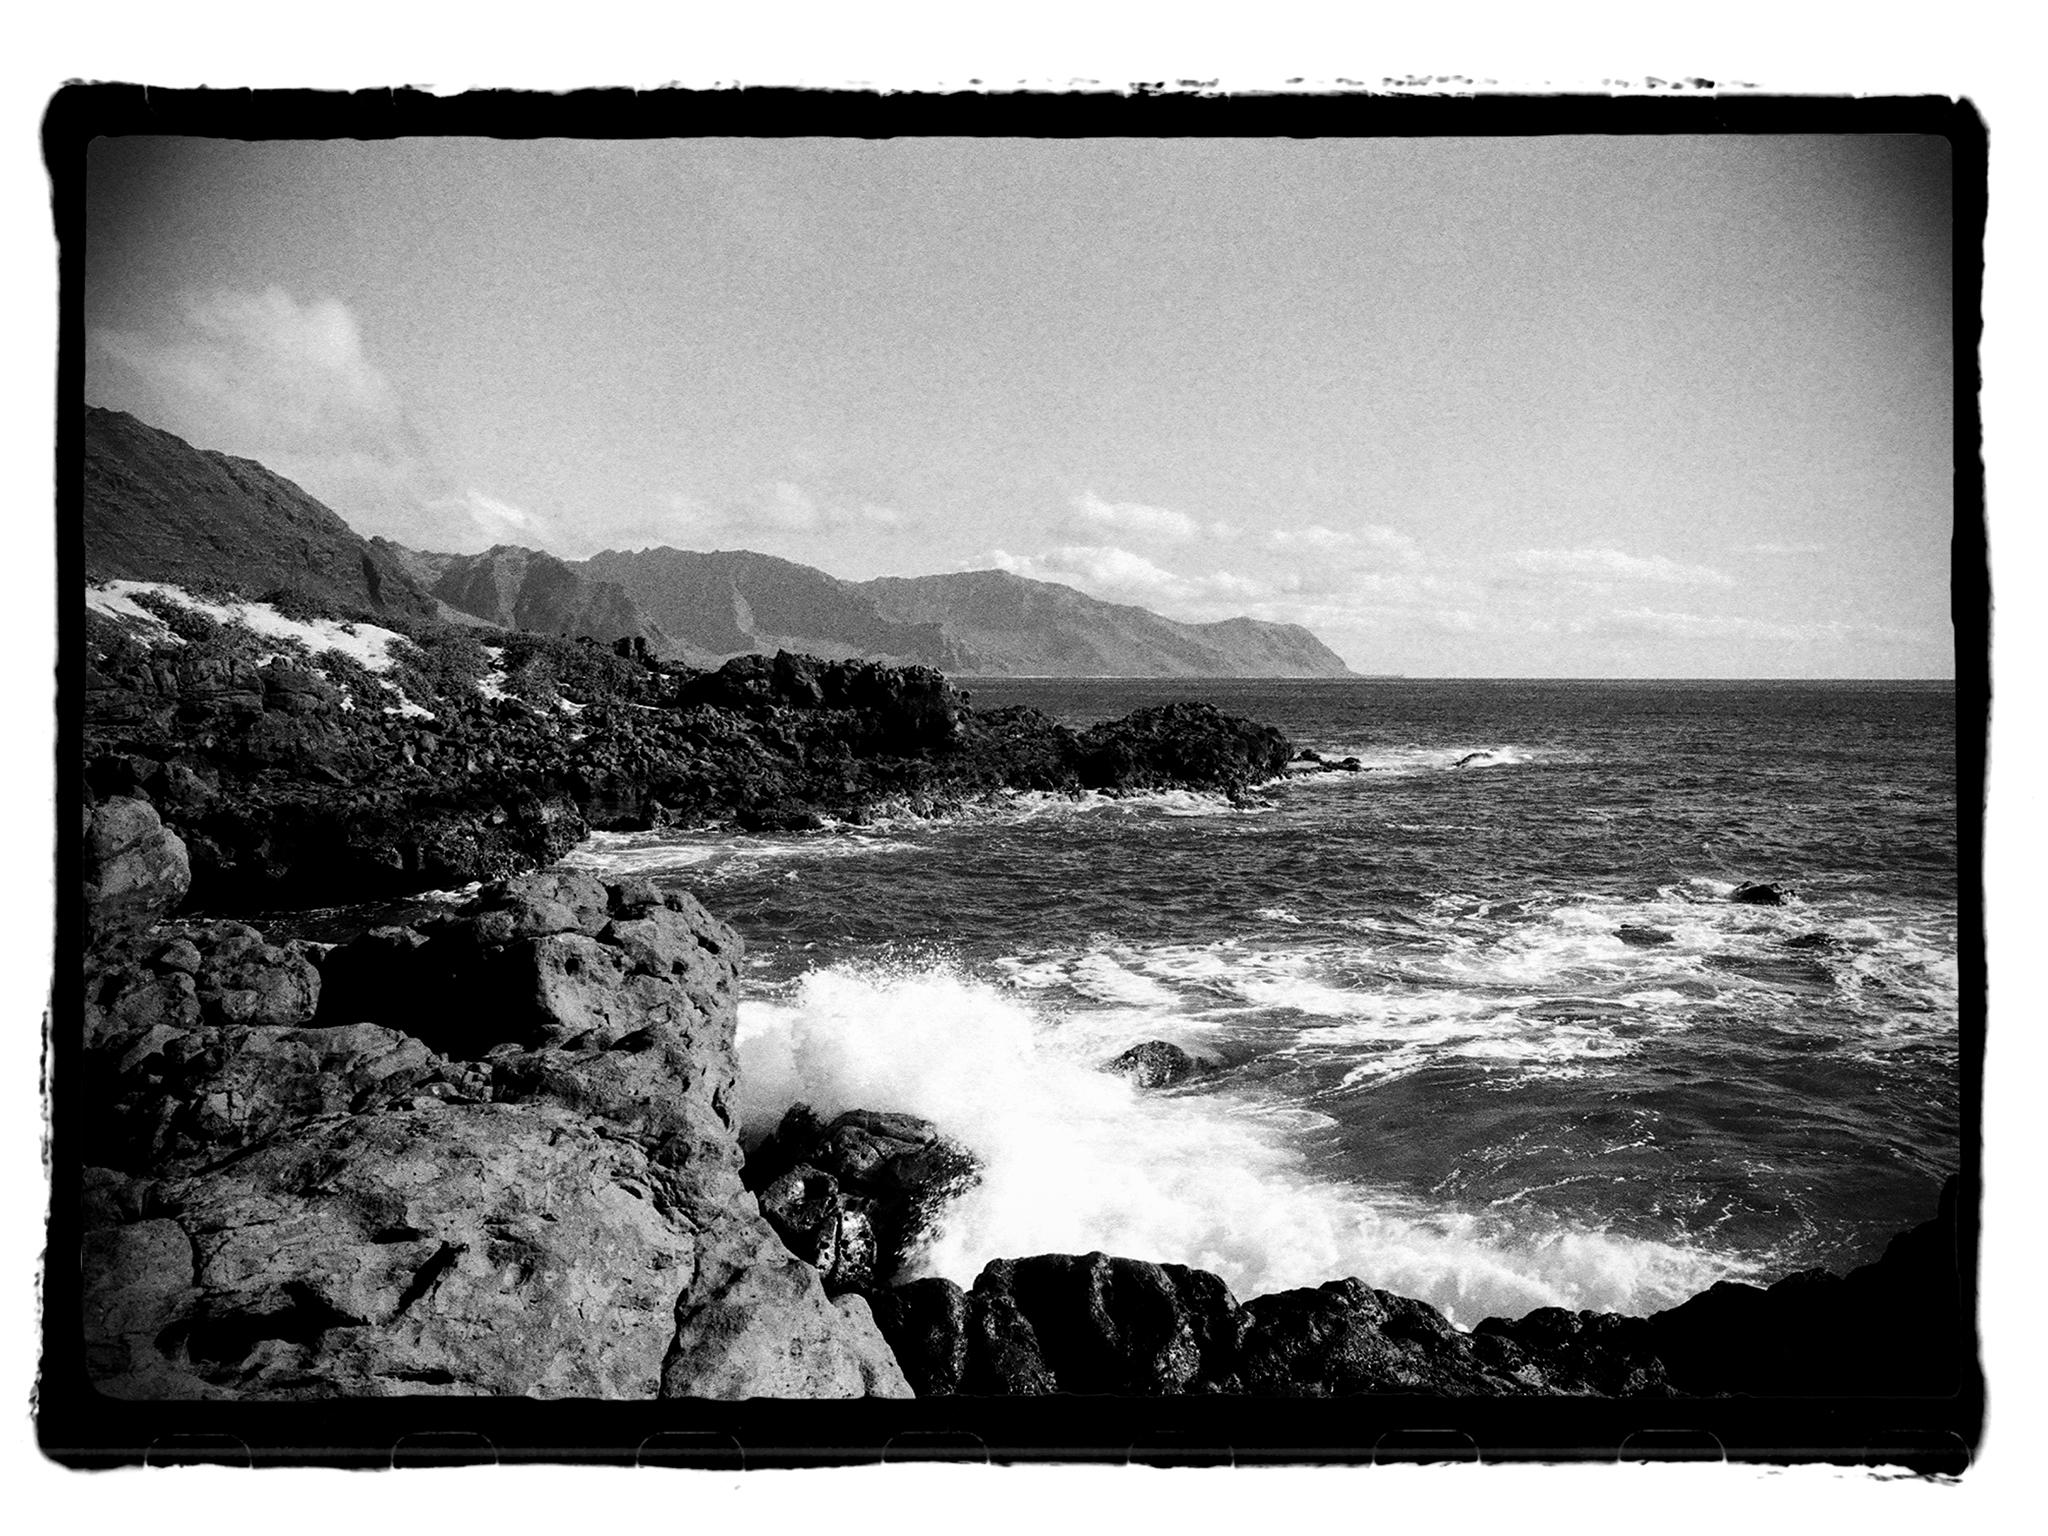 film-kaenapoint-border-blog.jpg